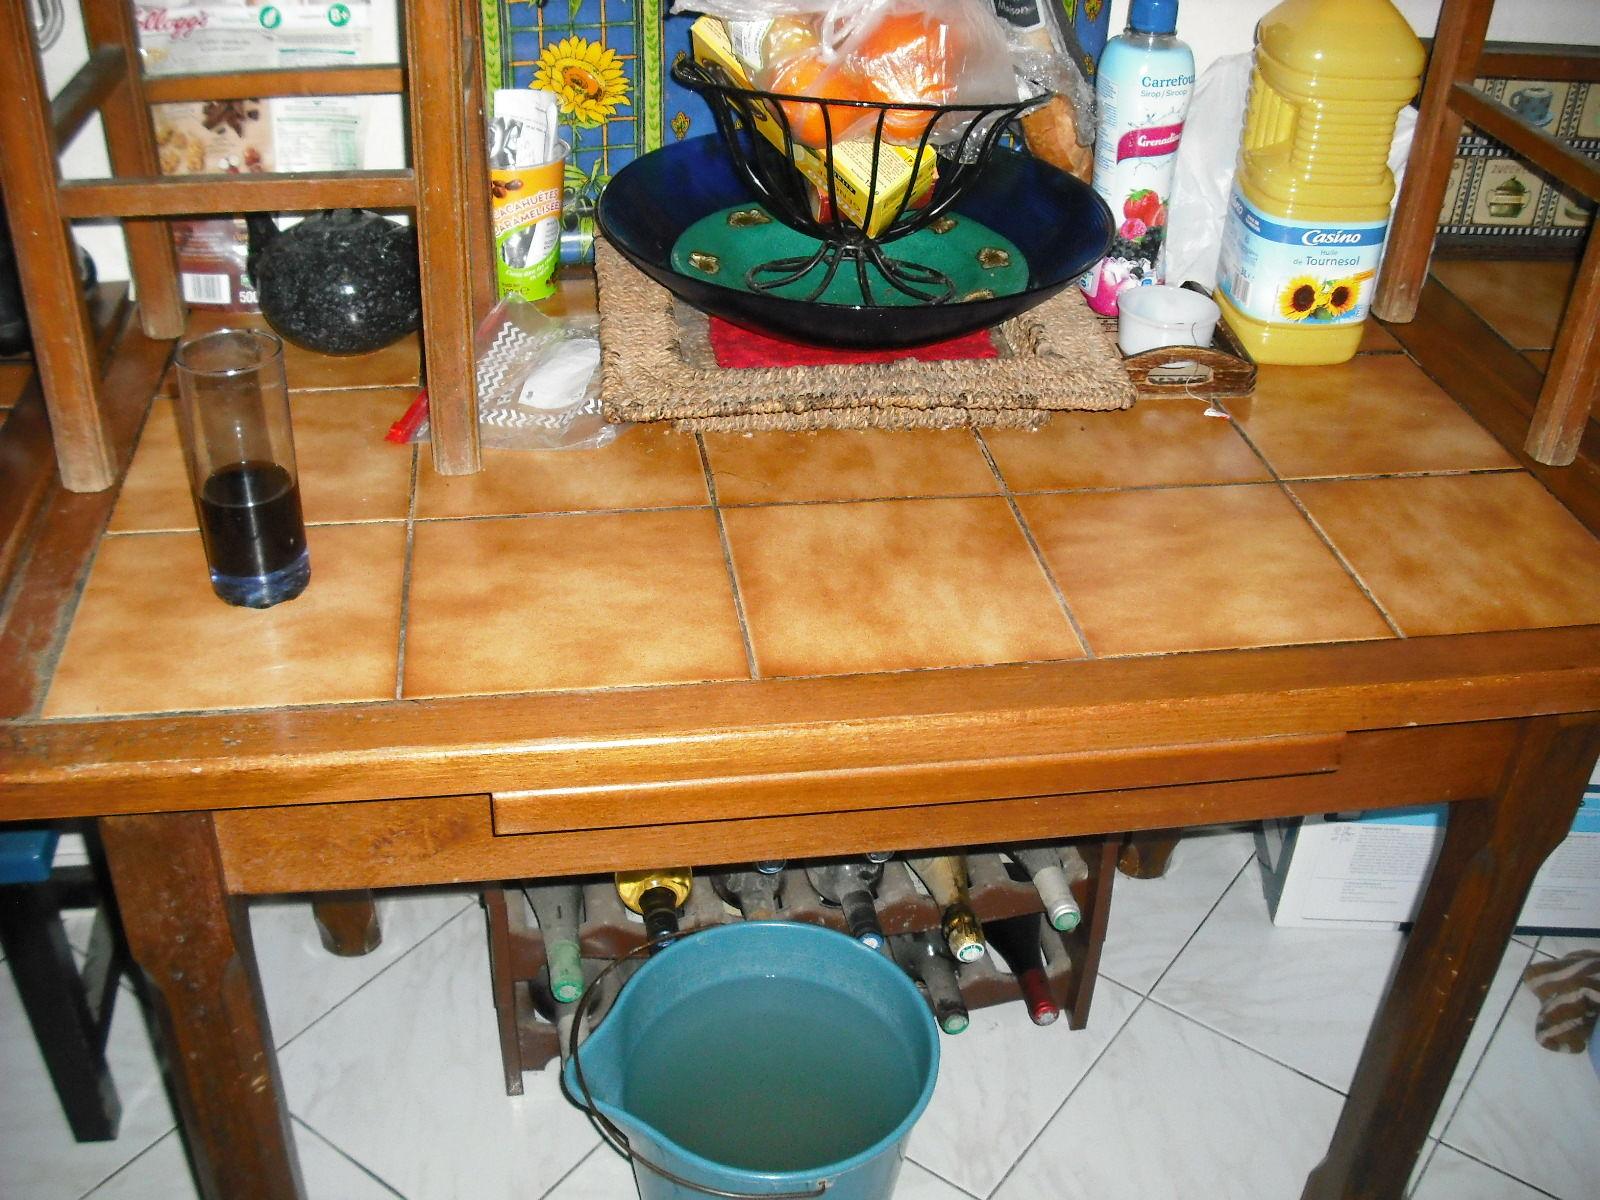 Table Cuisine Carrelee Avec Deux Rallonges concernant Table Carrelee Jardin